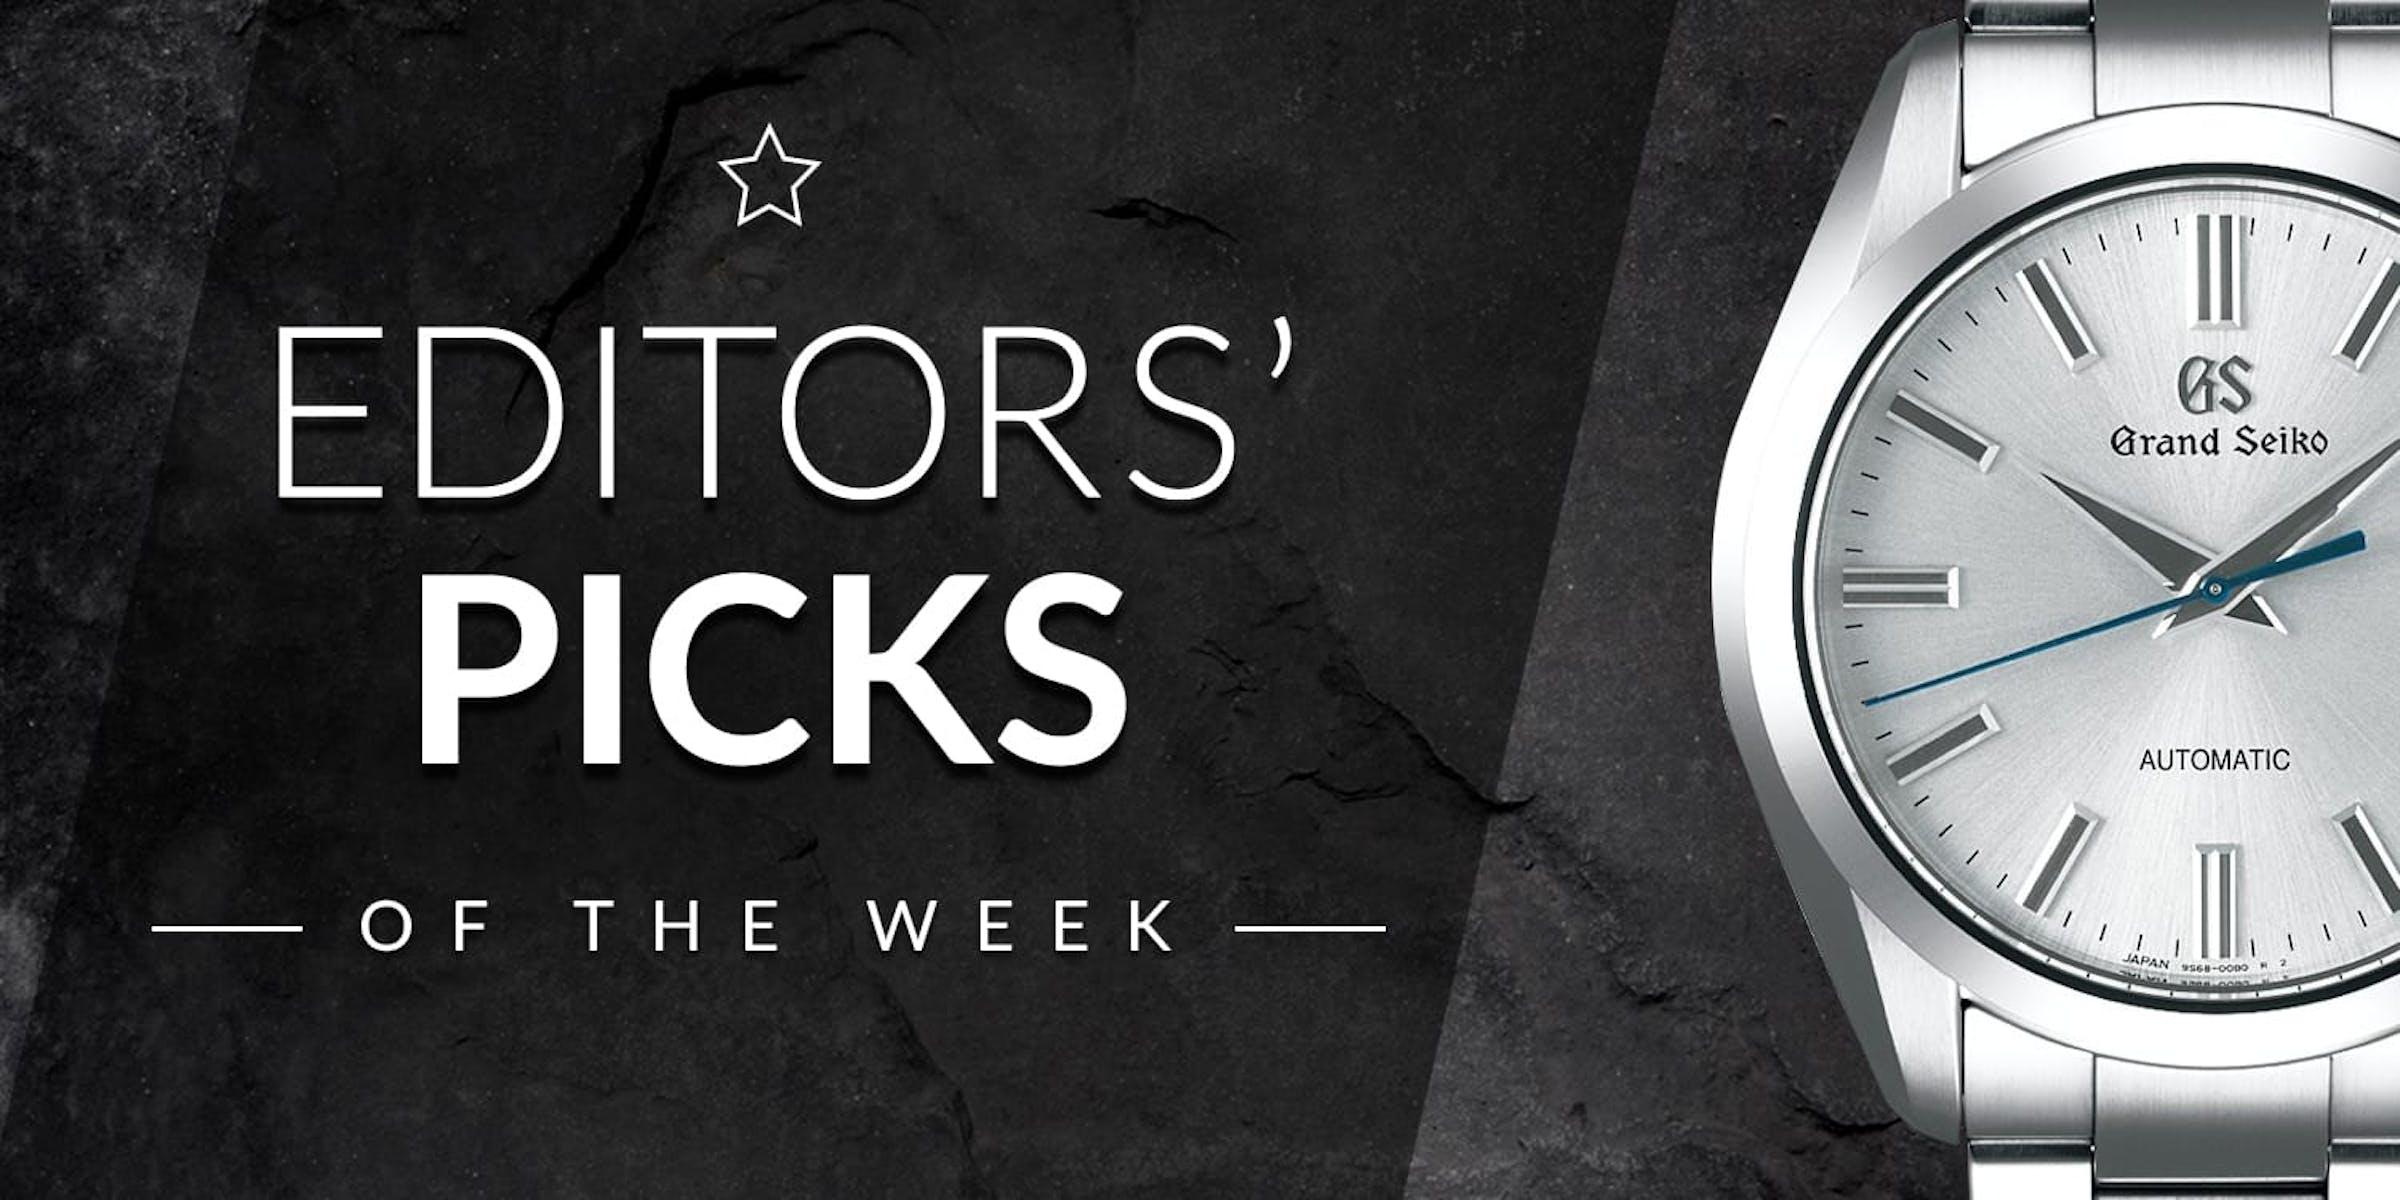 Editors' Picks der Woche: TAG Heuer, Hamilton und Grand Seiko